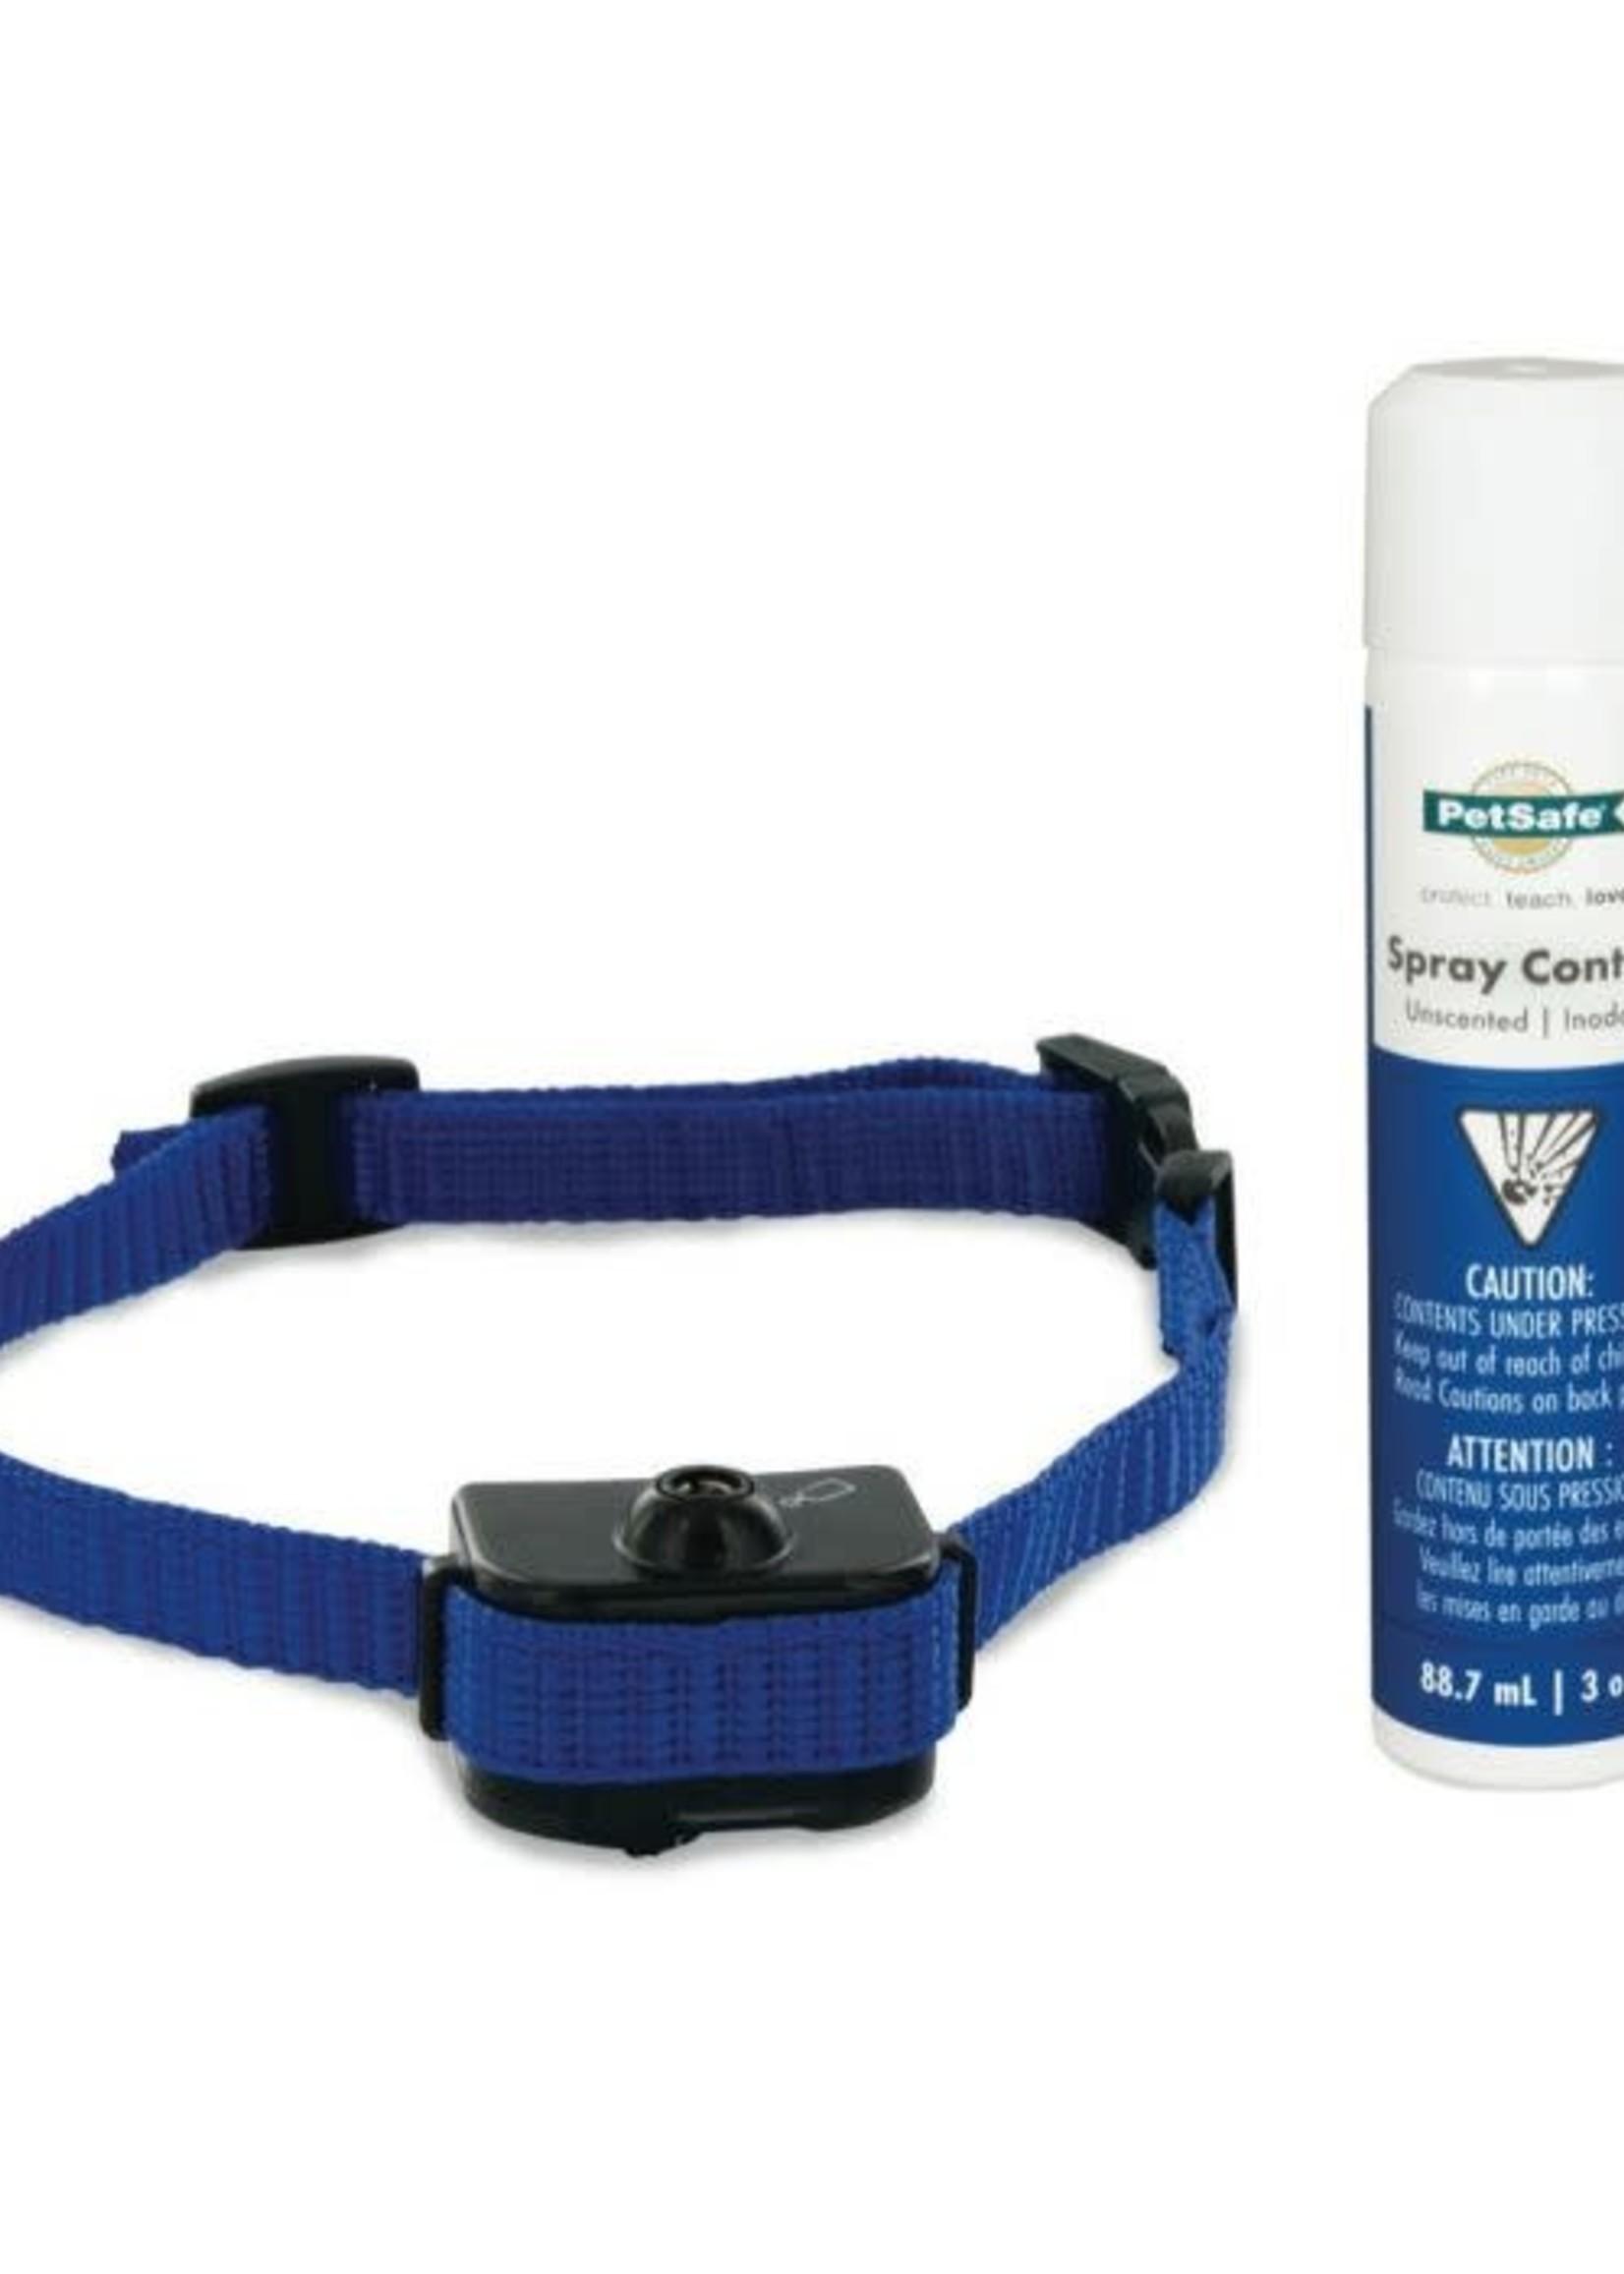 PetSafe® PetSafe® Little Dog Deluxe Anti-Bark Spray Collar